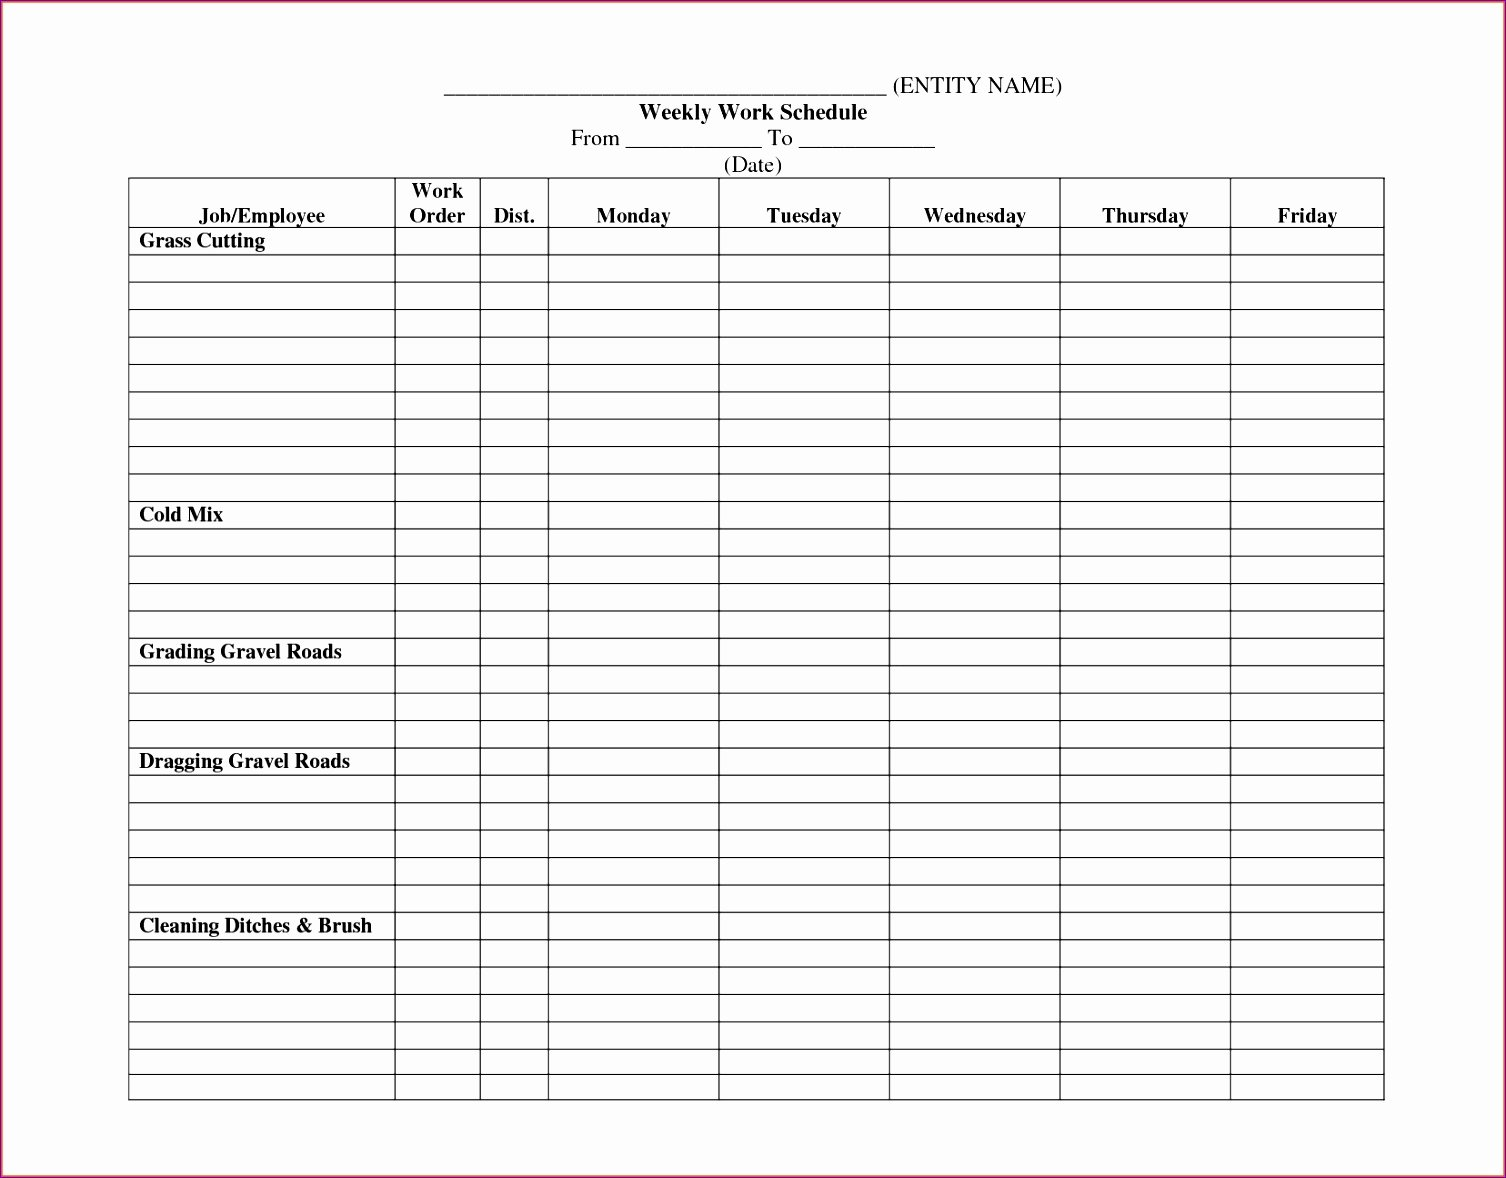 Staffing Plan Template Excel Elegant 12 Staffing Schedule Template Excel Free Exceltemplates